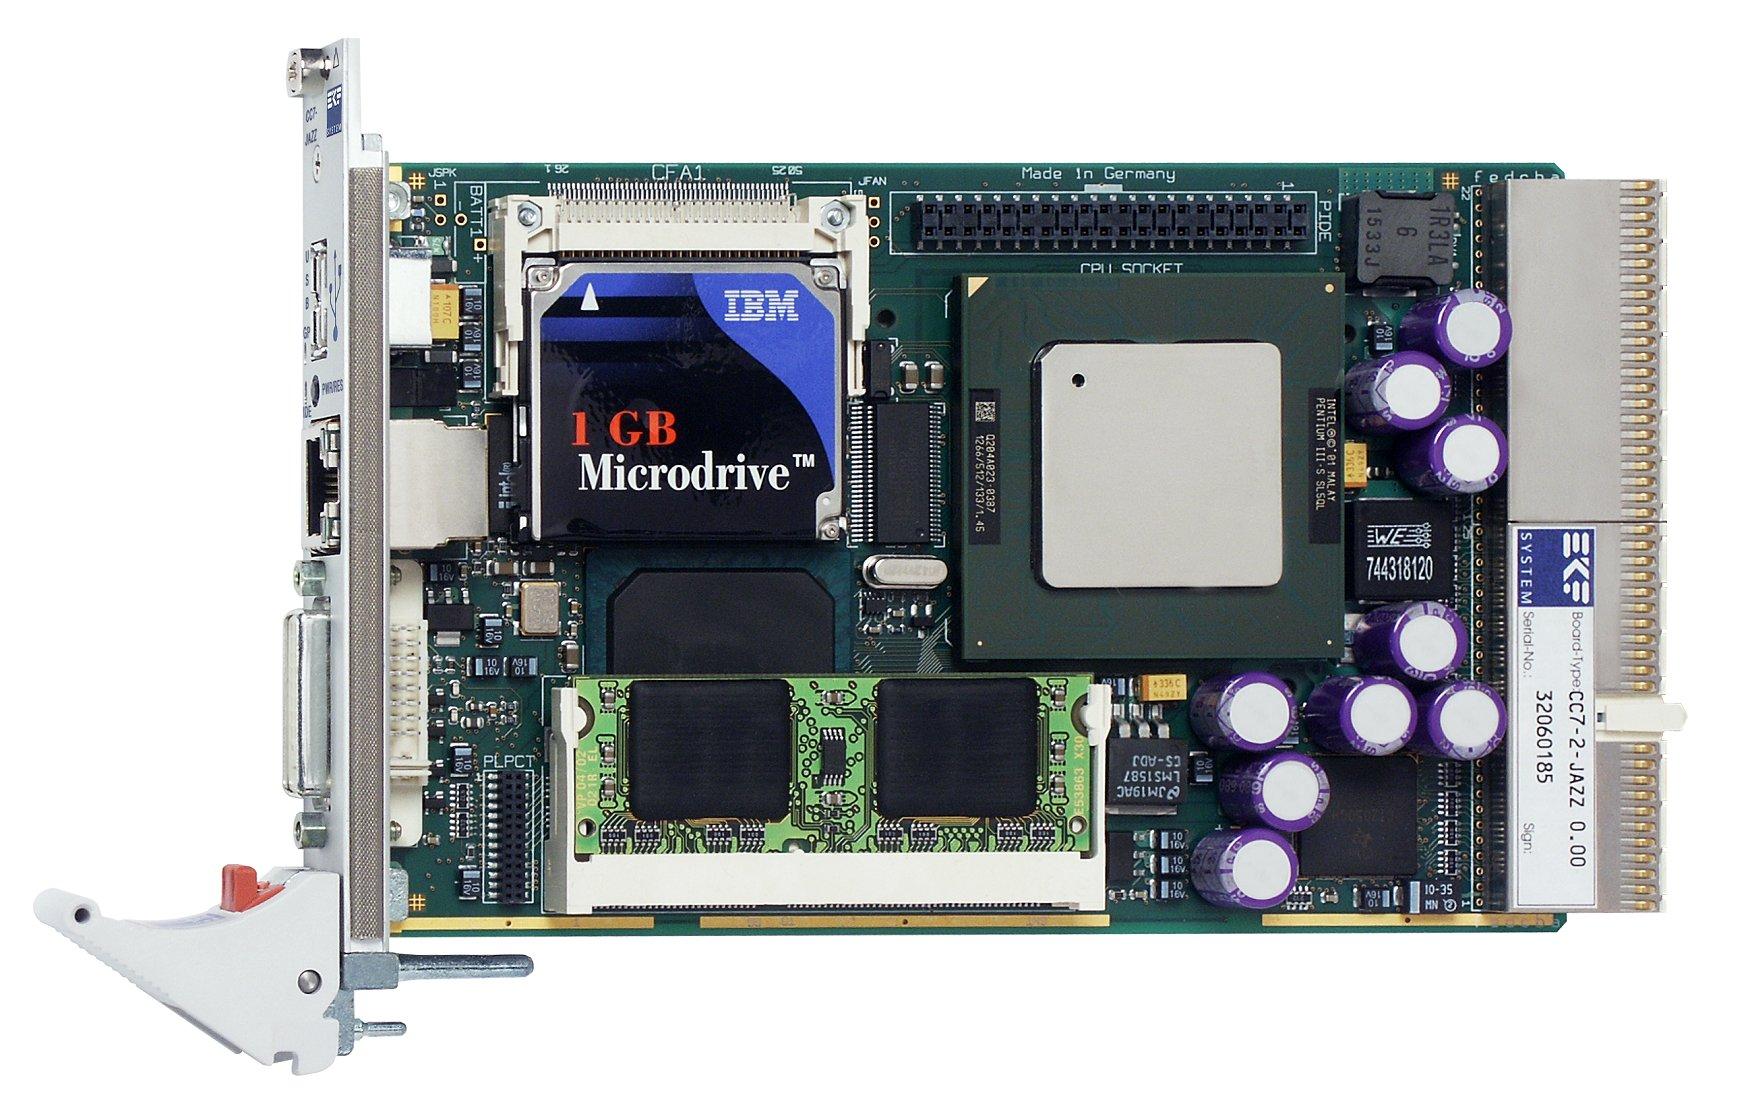 Ekf Compactpci Cpu Boards Cc7 Jazz Pentium Iii Tualatin 3 Block Diagram 1 2 Print Quality 300dpi 10x15cm 035mb